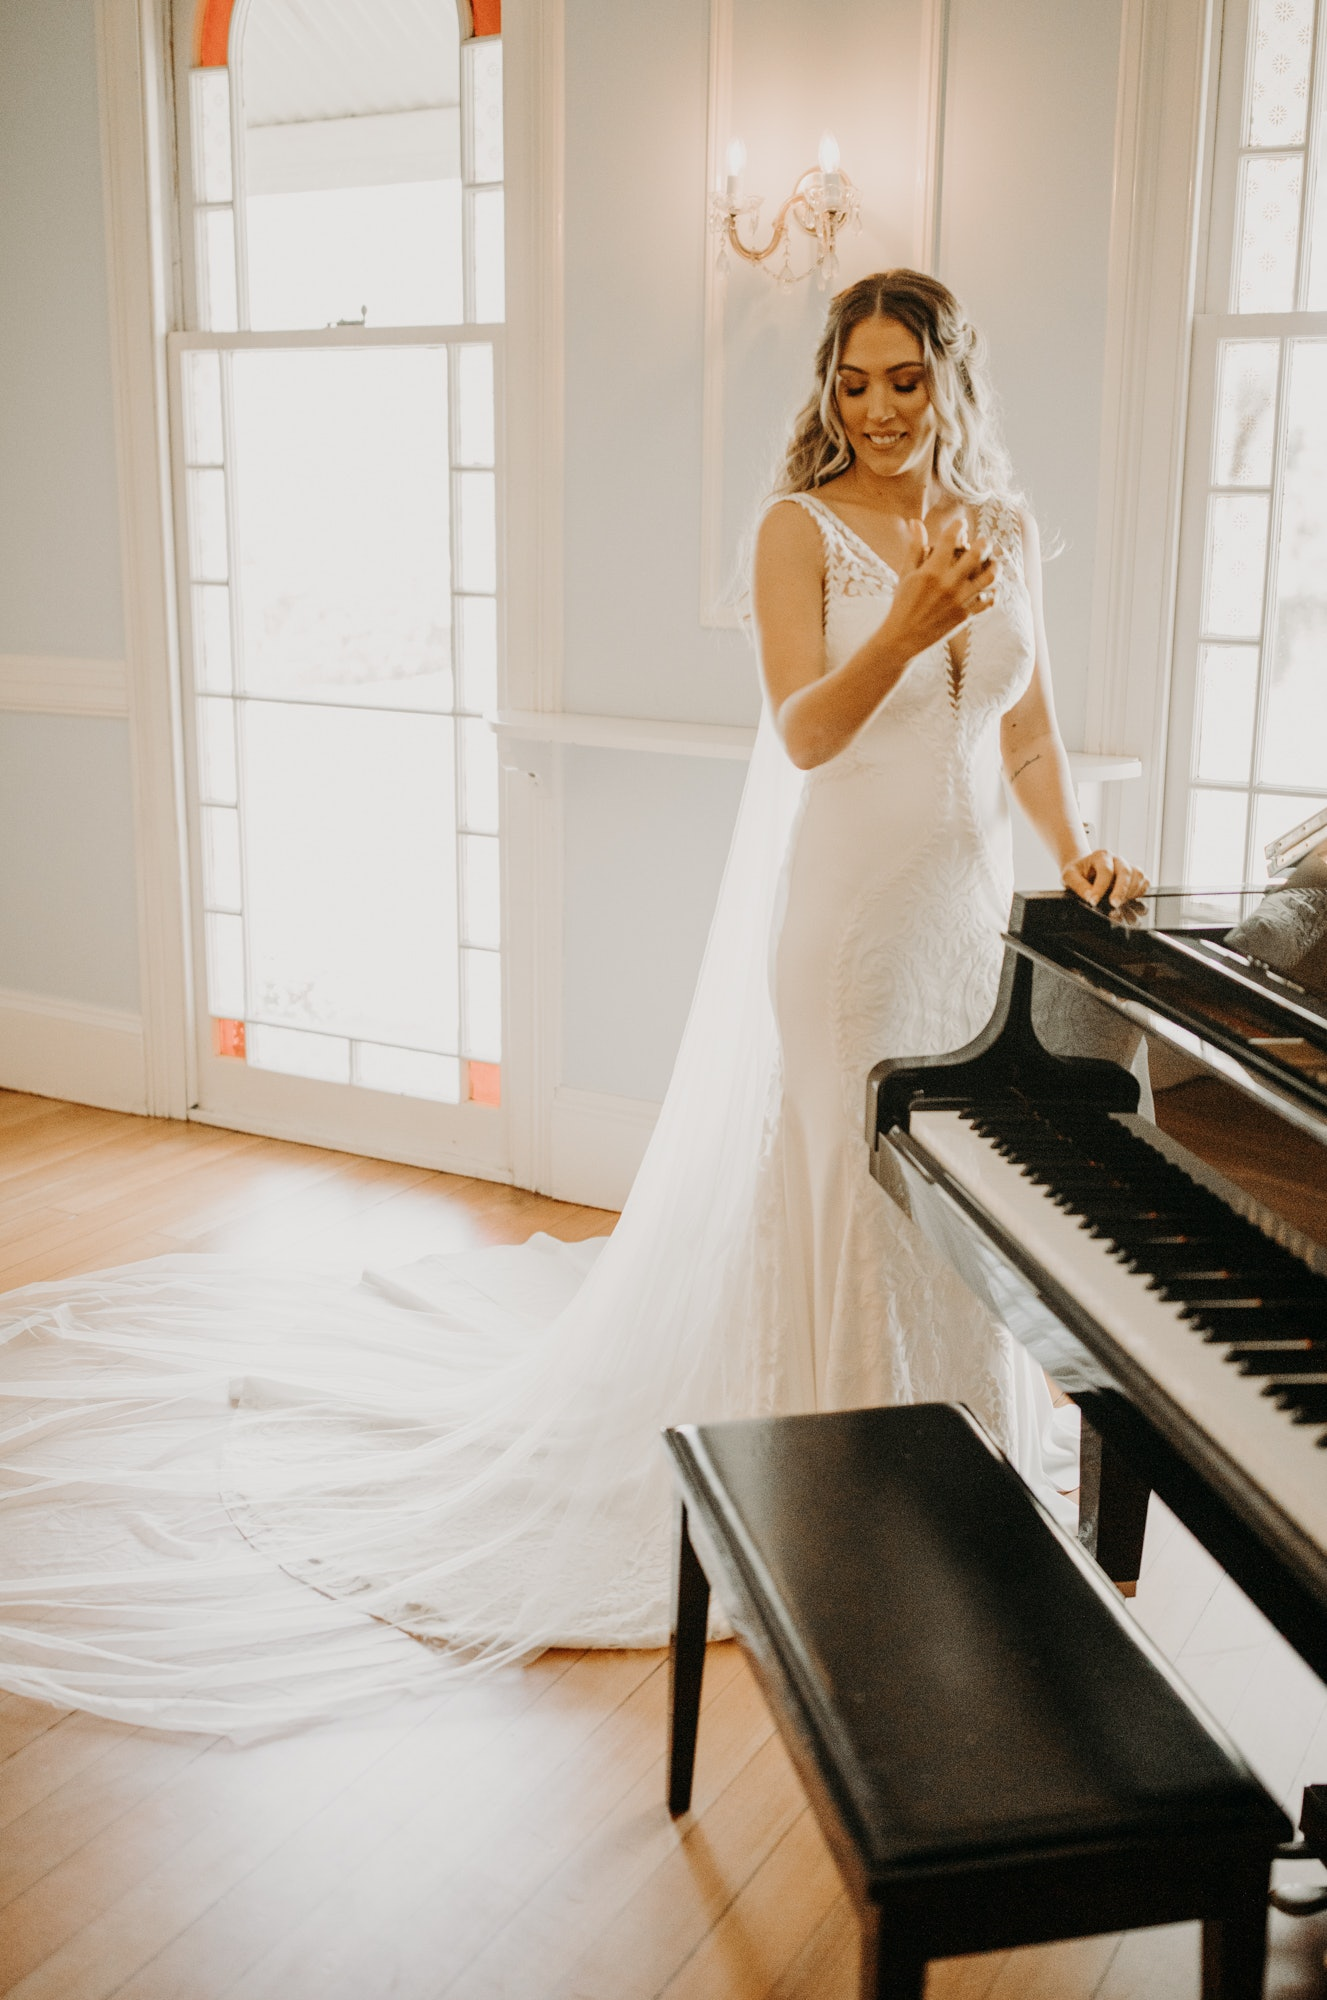 Bride posing near piano